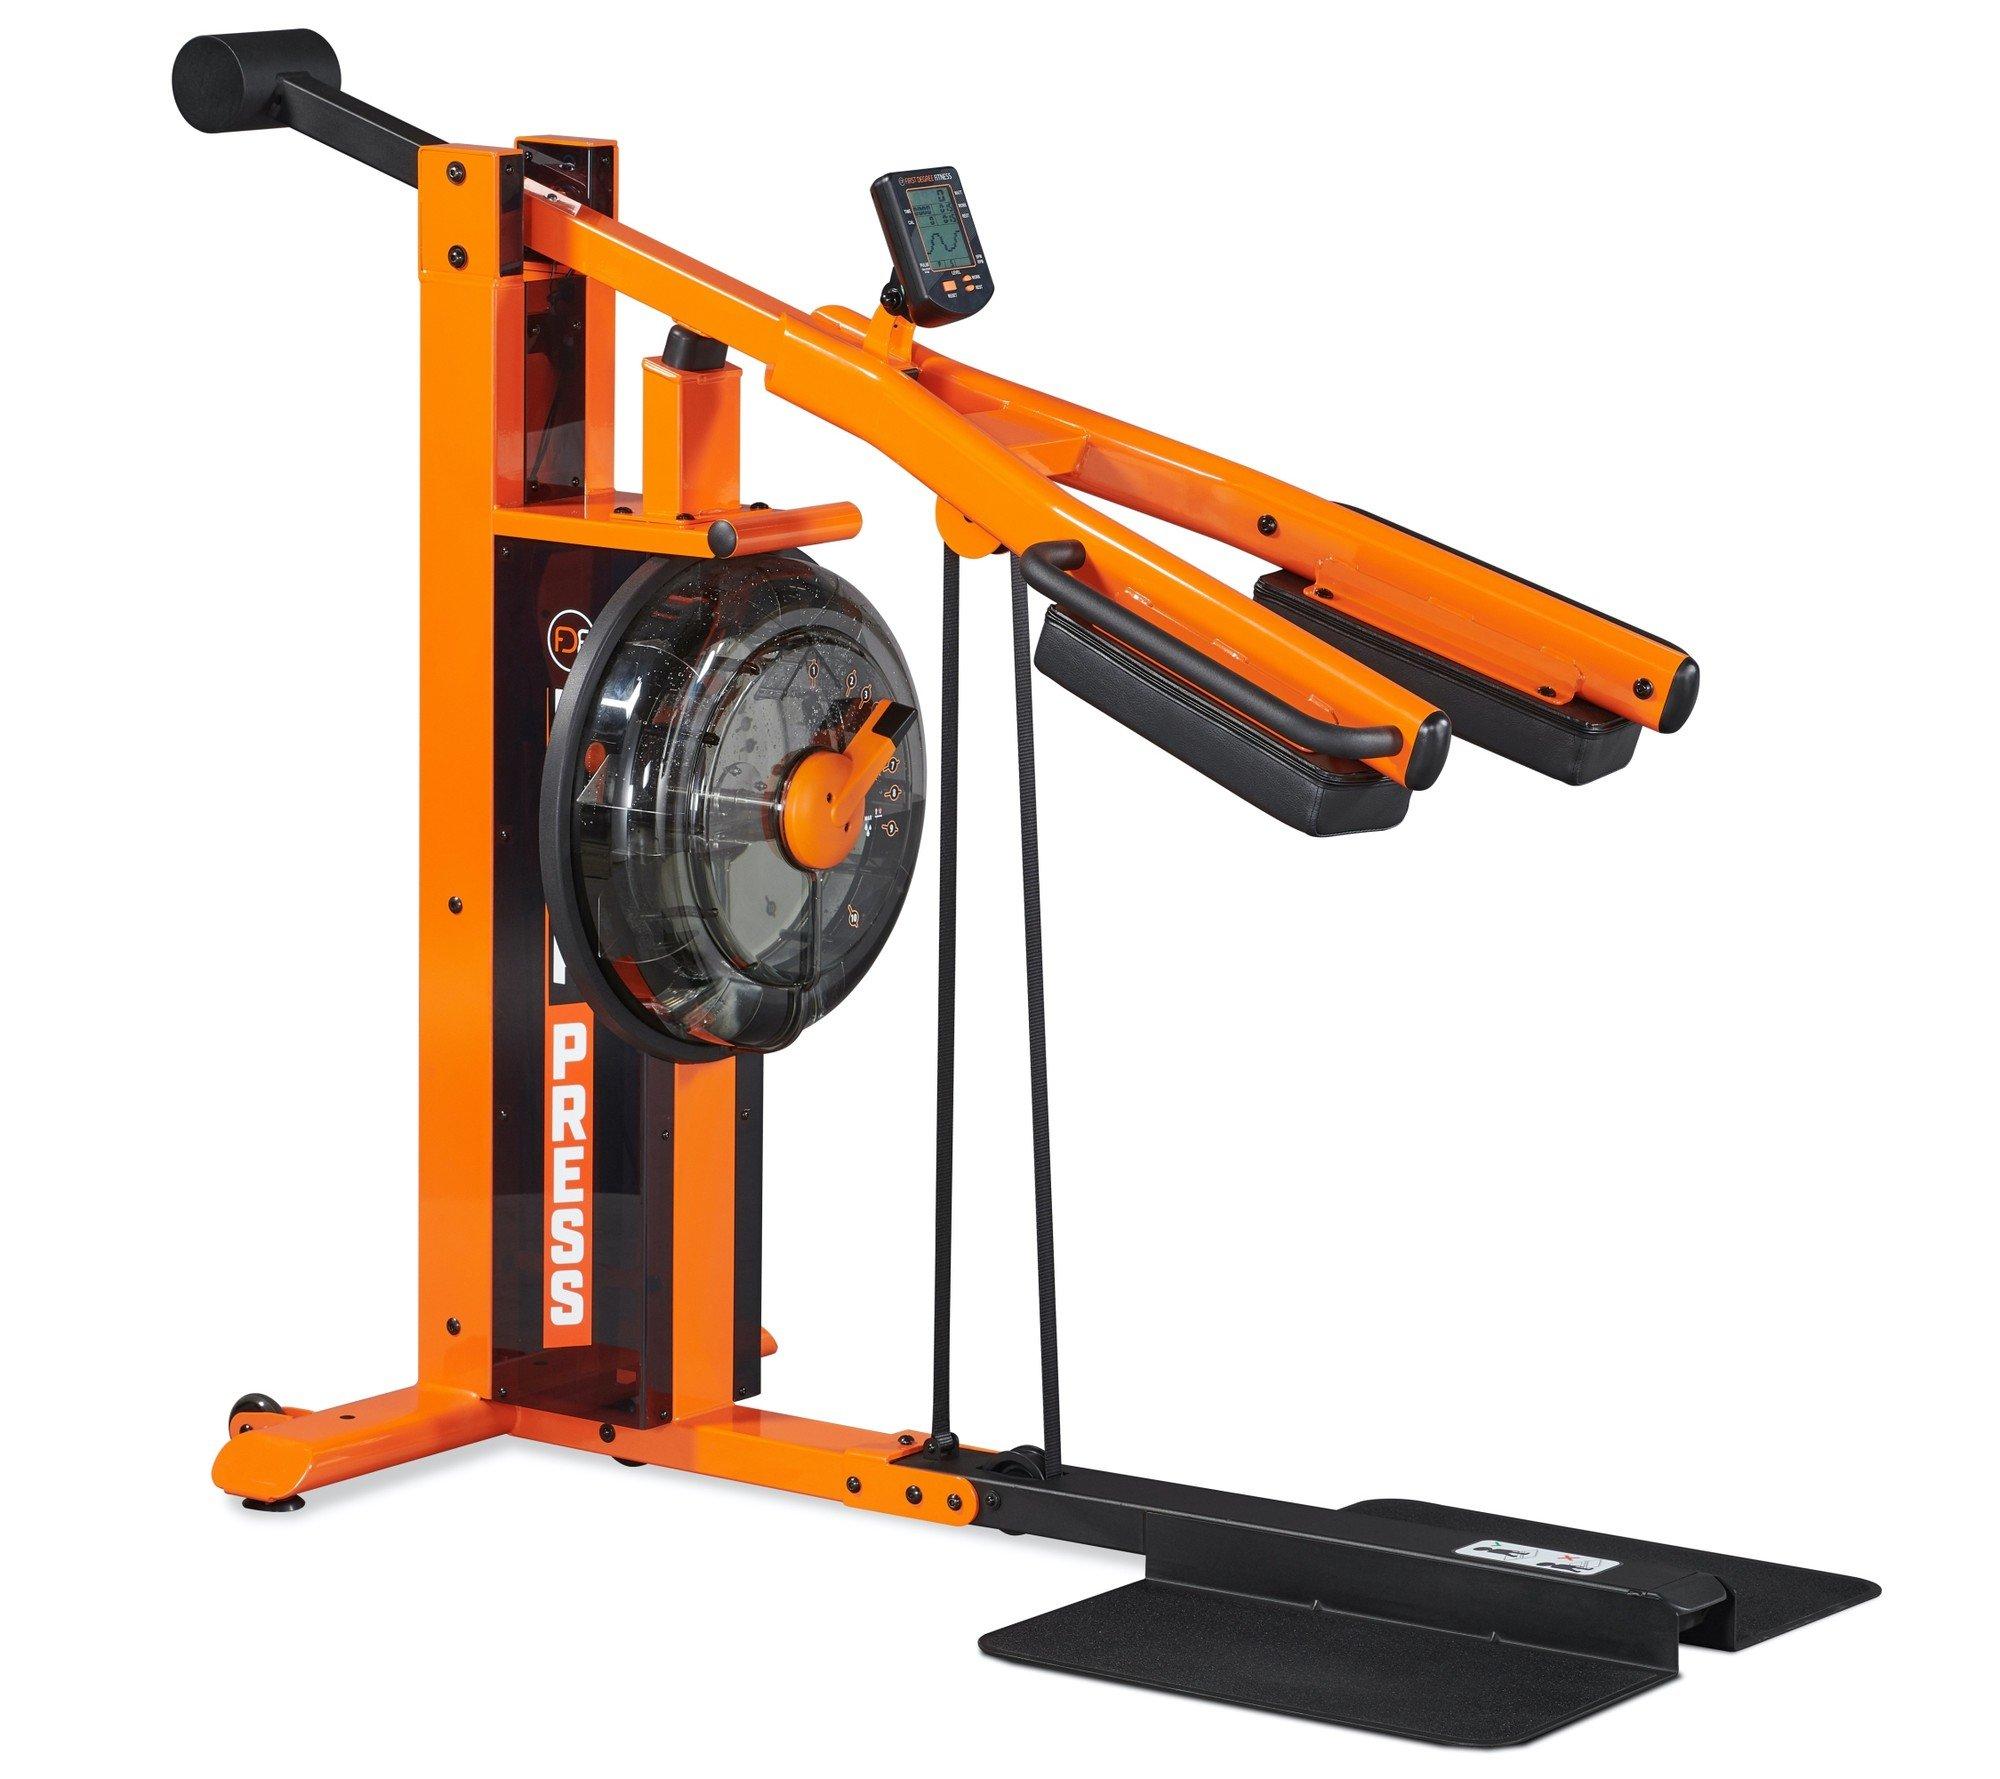 Afbeelding van First Degree PowerZone Press - oranje